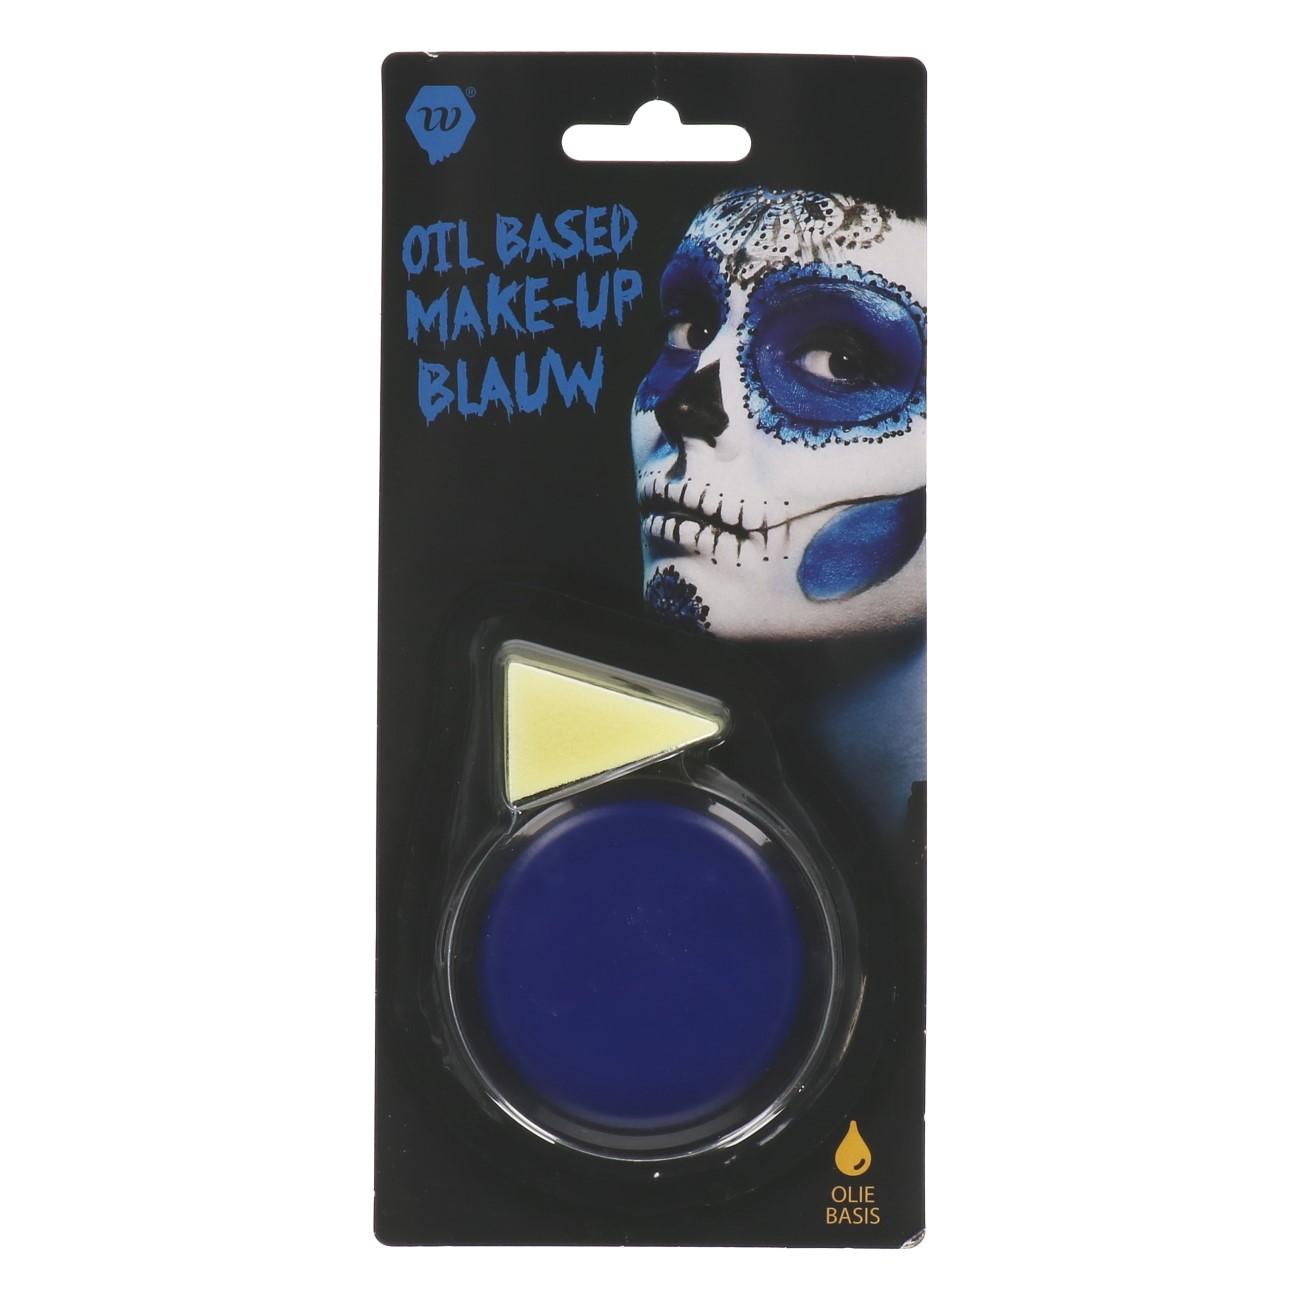 Oil-Based Make-up Donker Blauw Wauwfactor